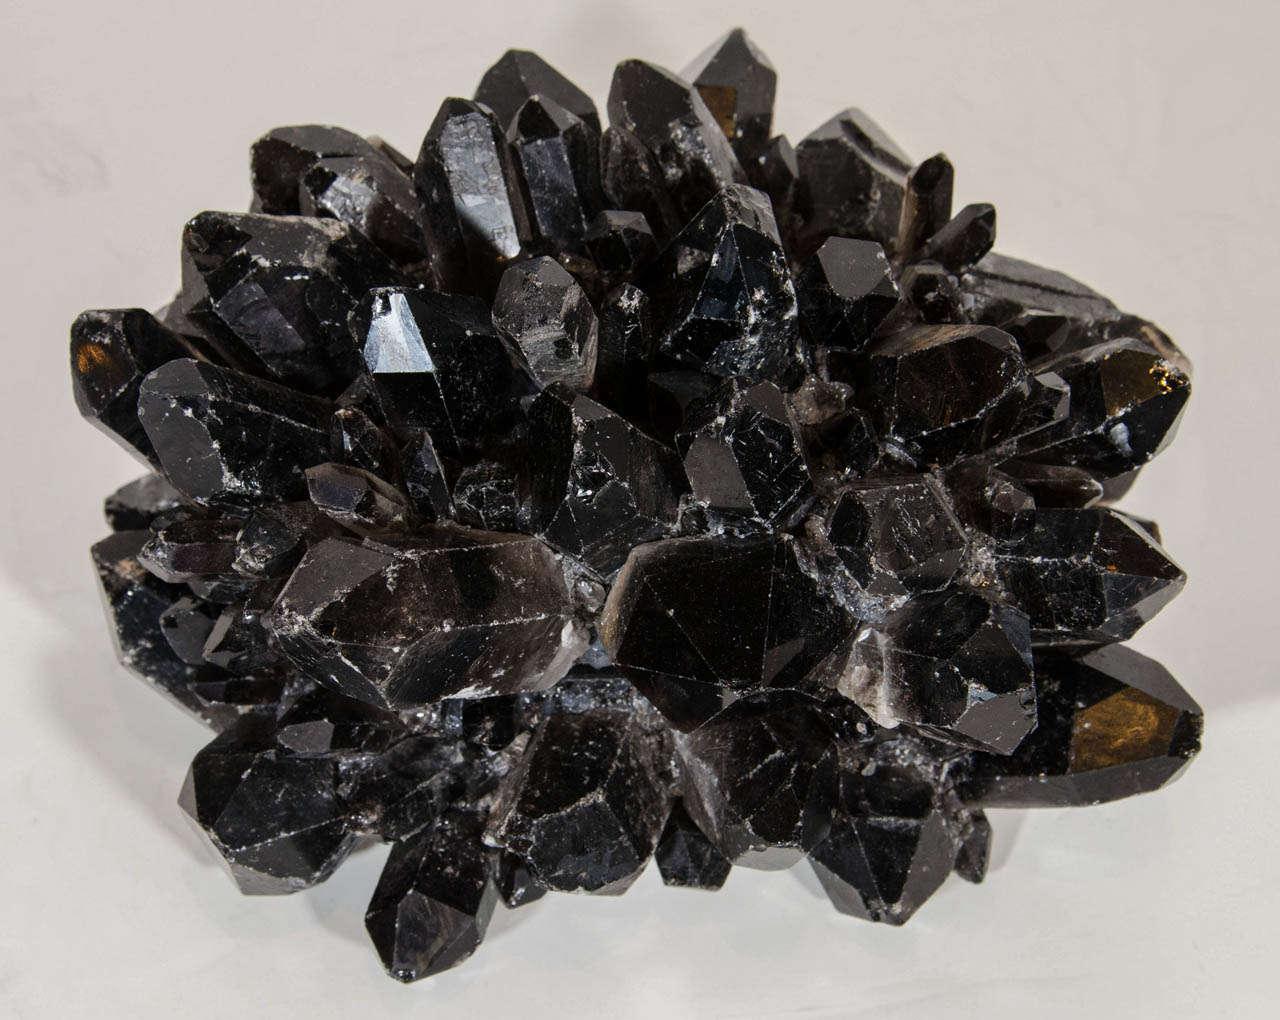 Exquisite And Rare Black Quartz Crystal Decorative Box At 1stdibs